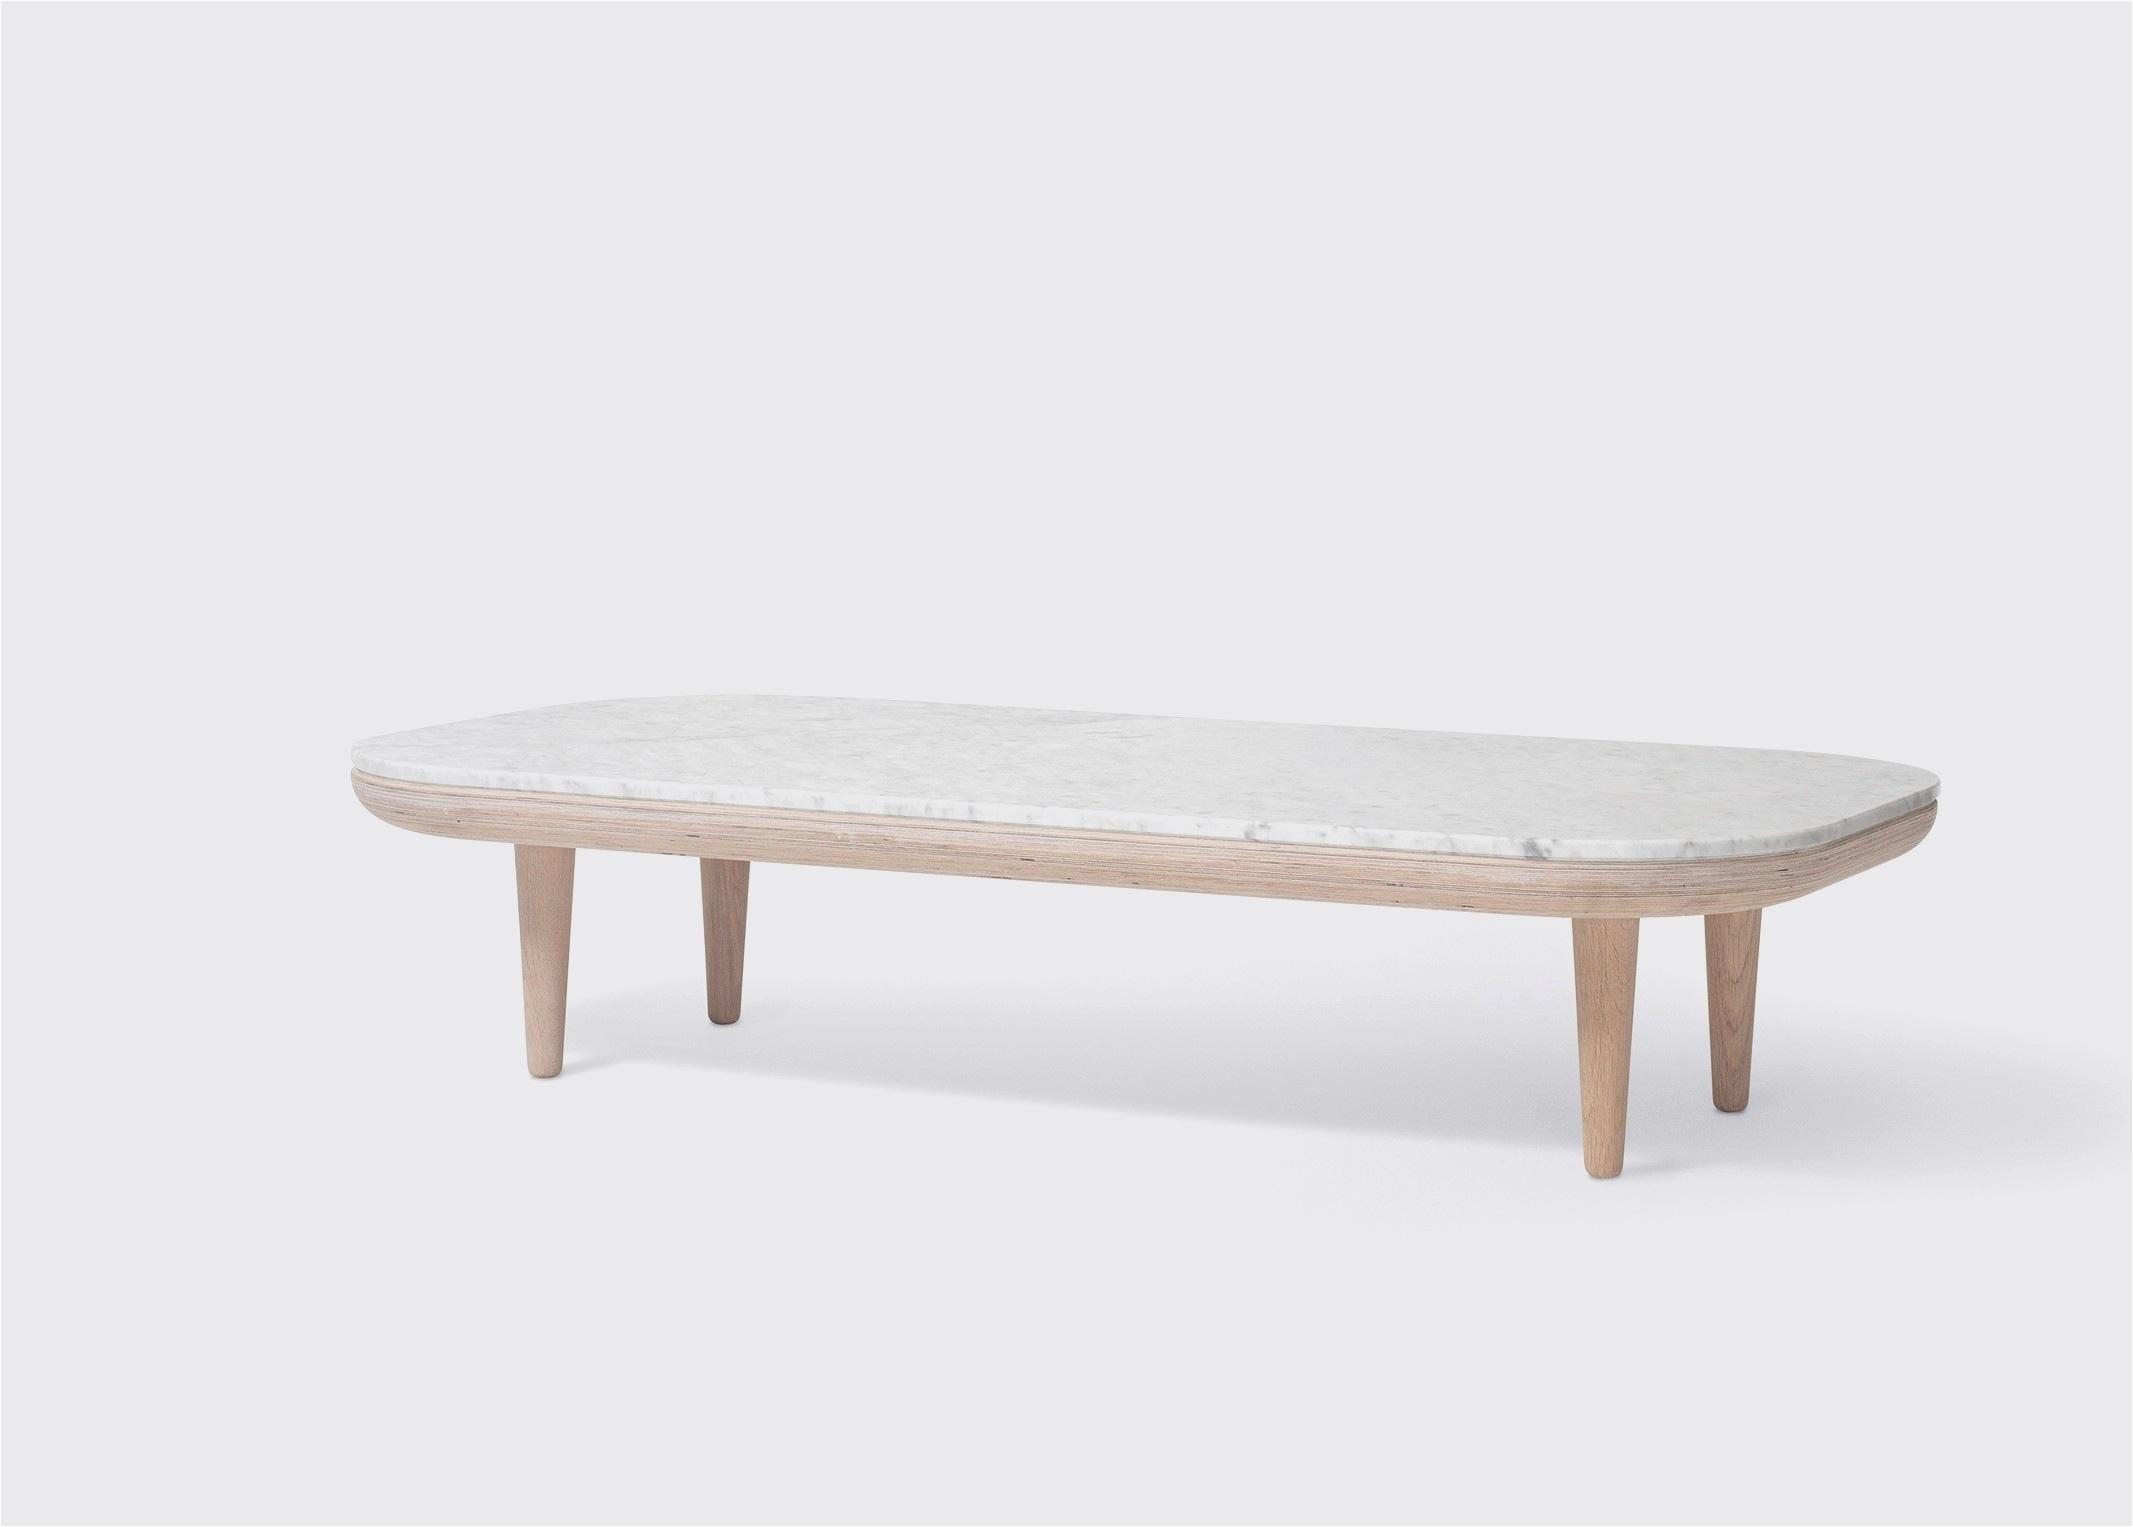 Canape Neo Conforama Impressionnant Galerie 20 Beau Table De Salon Conforama